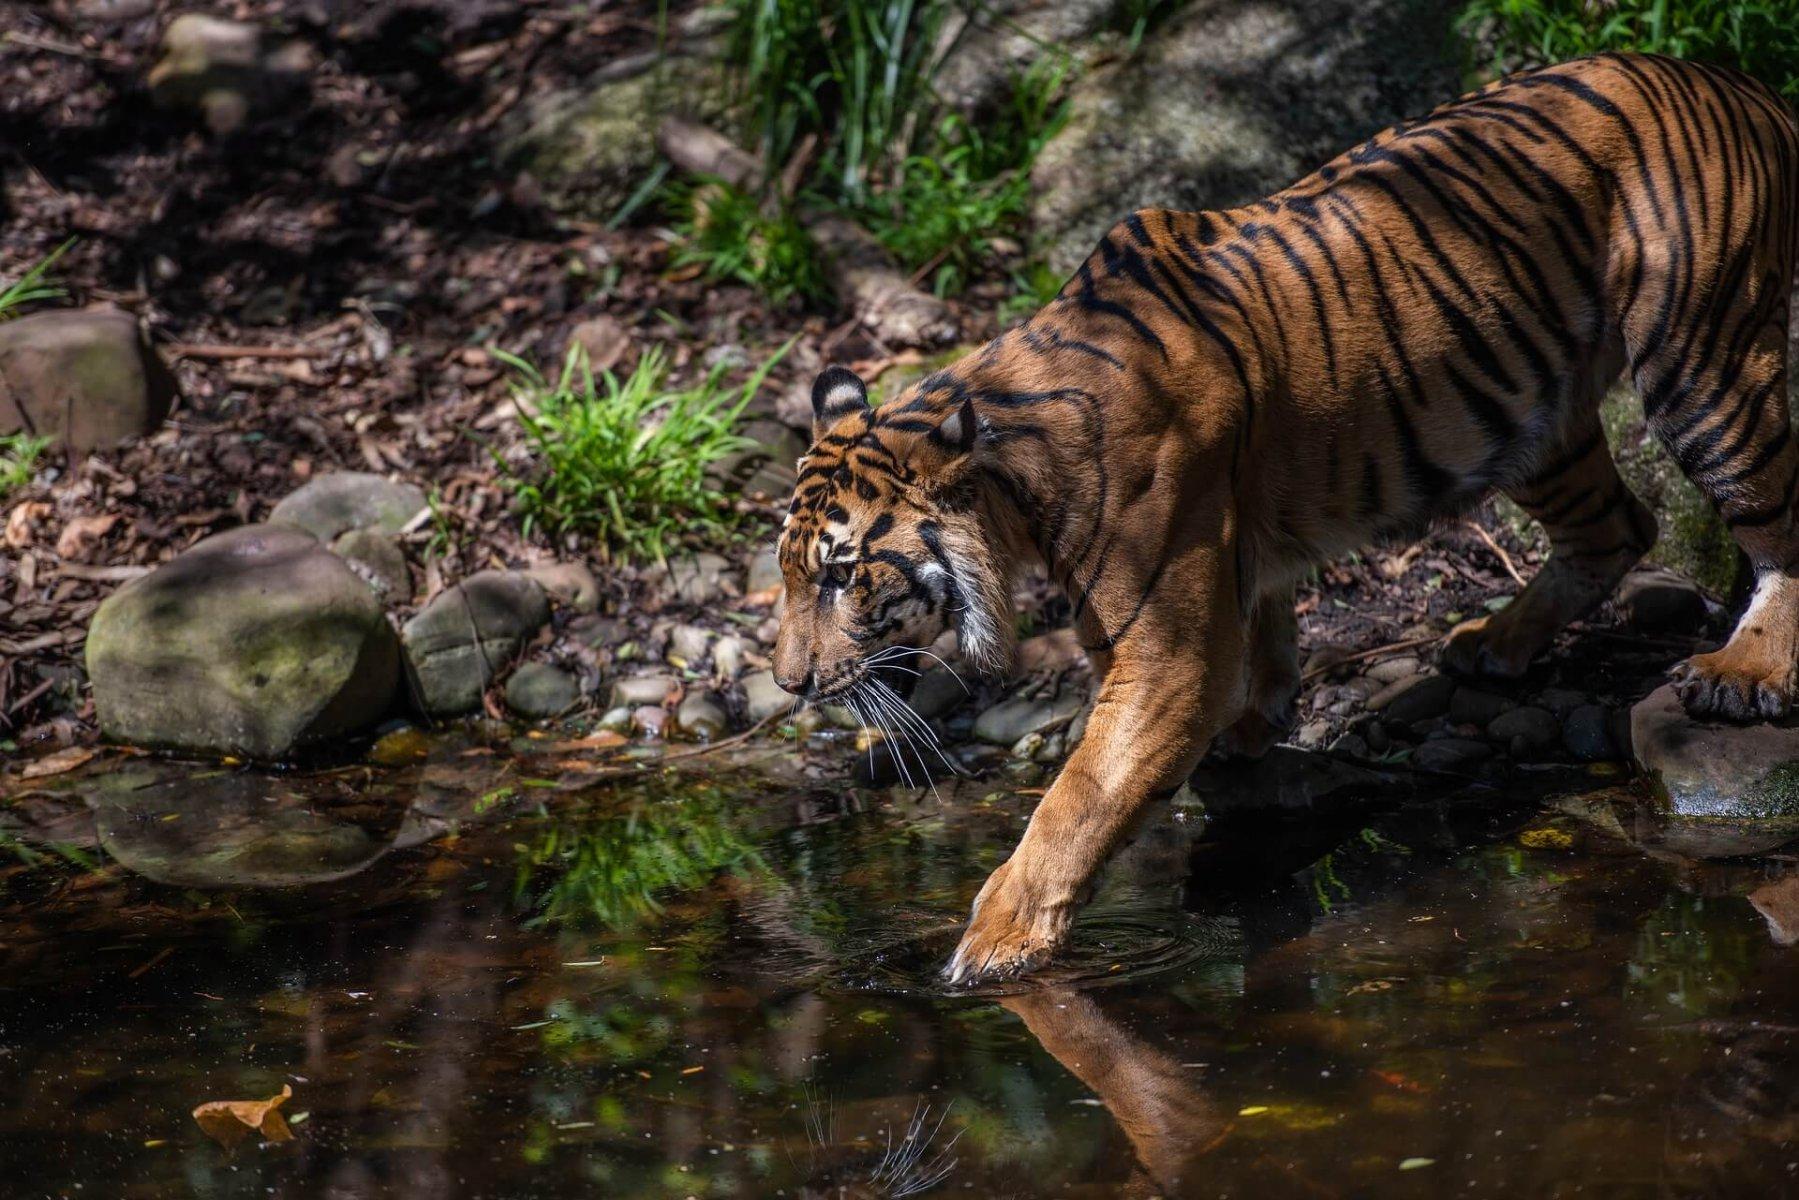 Researchers studied a rubber plantation's effect on the Sumatran tiger © Pen Ash / Pixabay